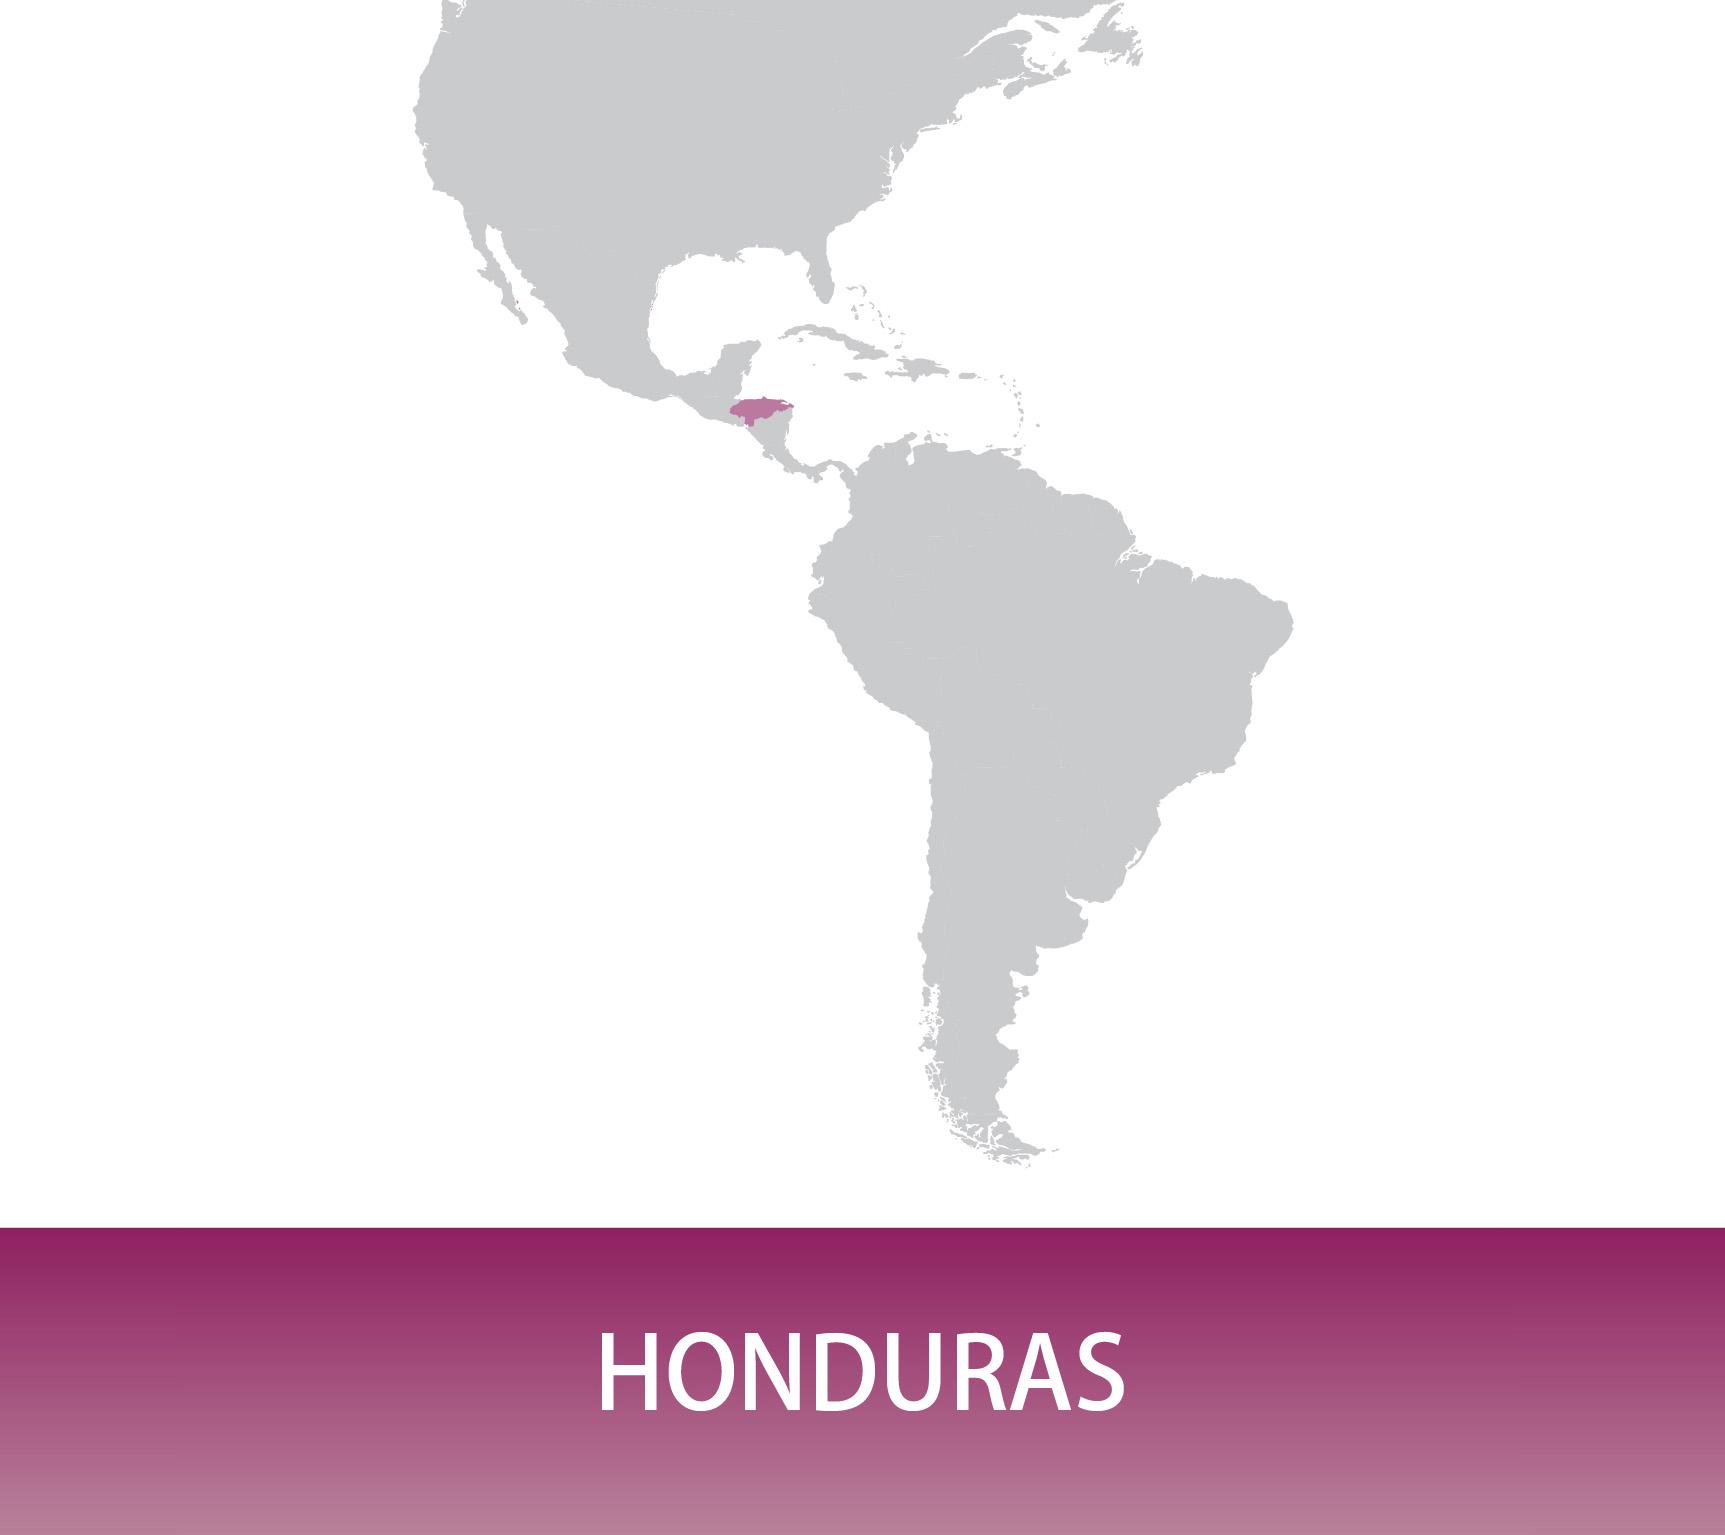 Honduras SHG San José Maresol